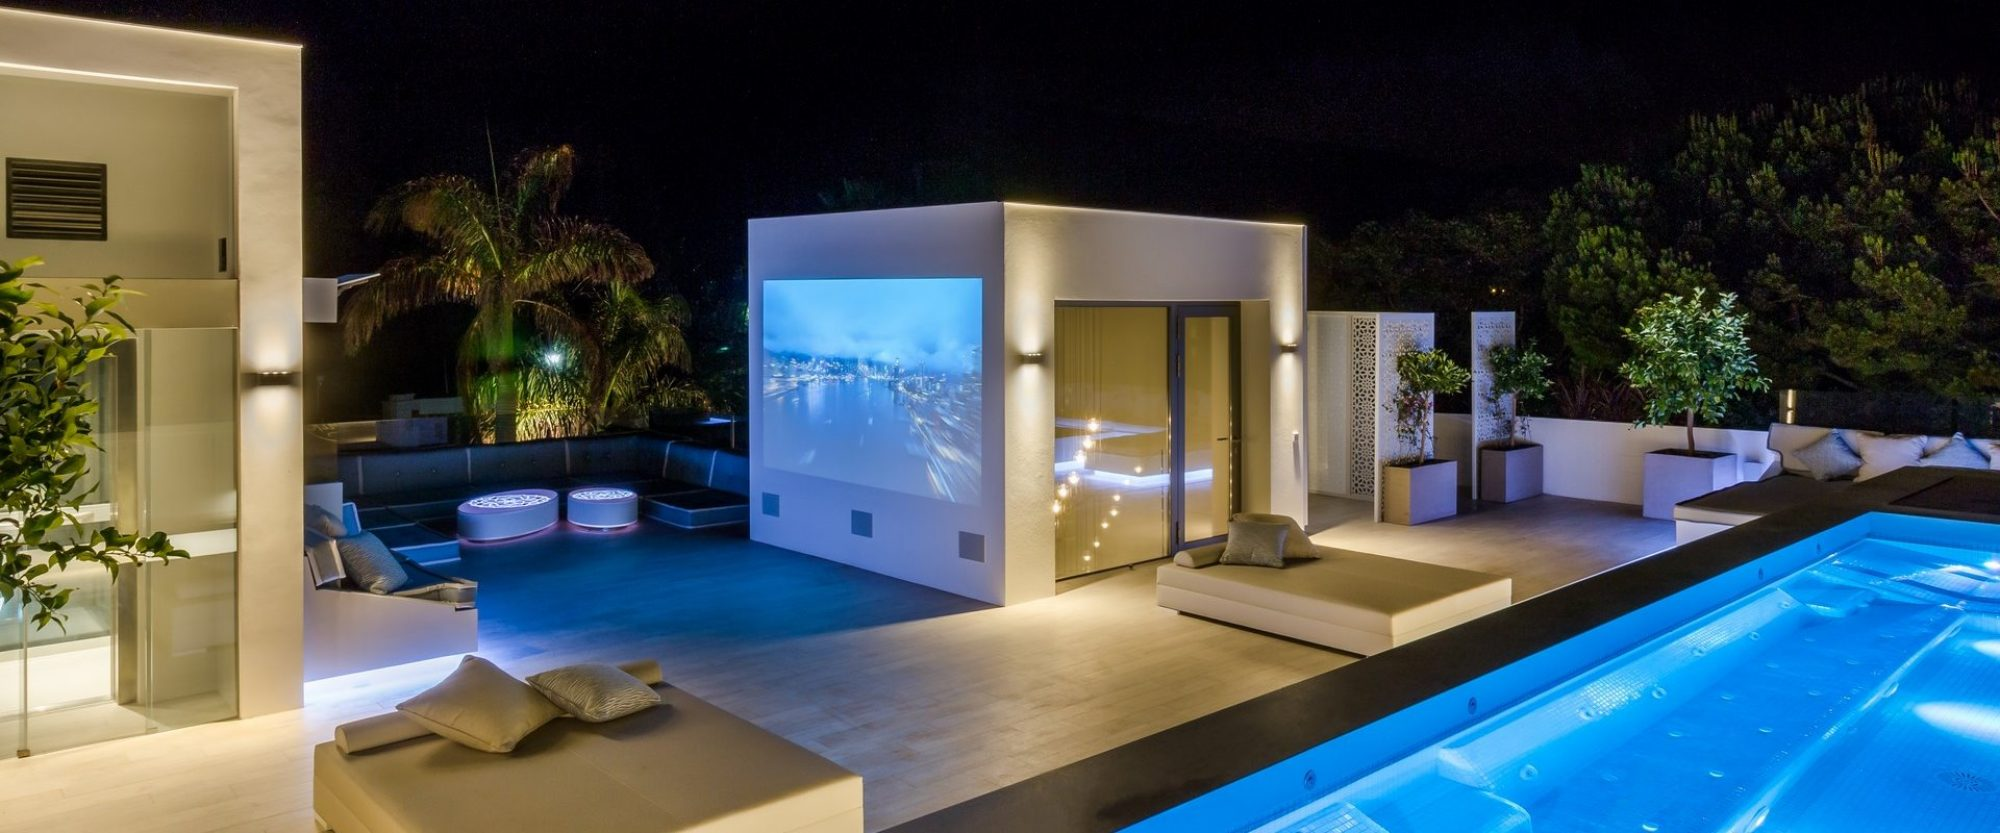 227 m2 roof garden vip area with cinema and la concha mountain views